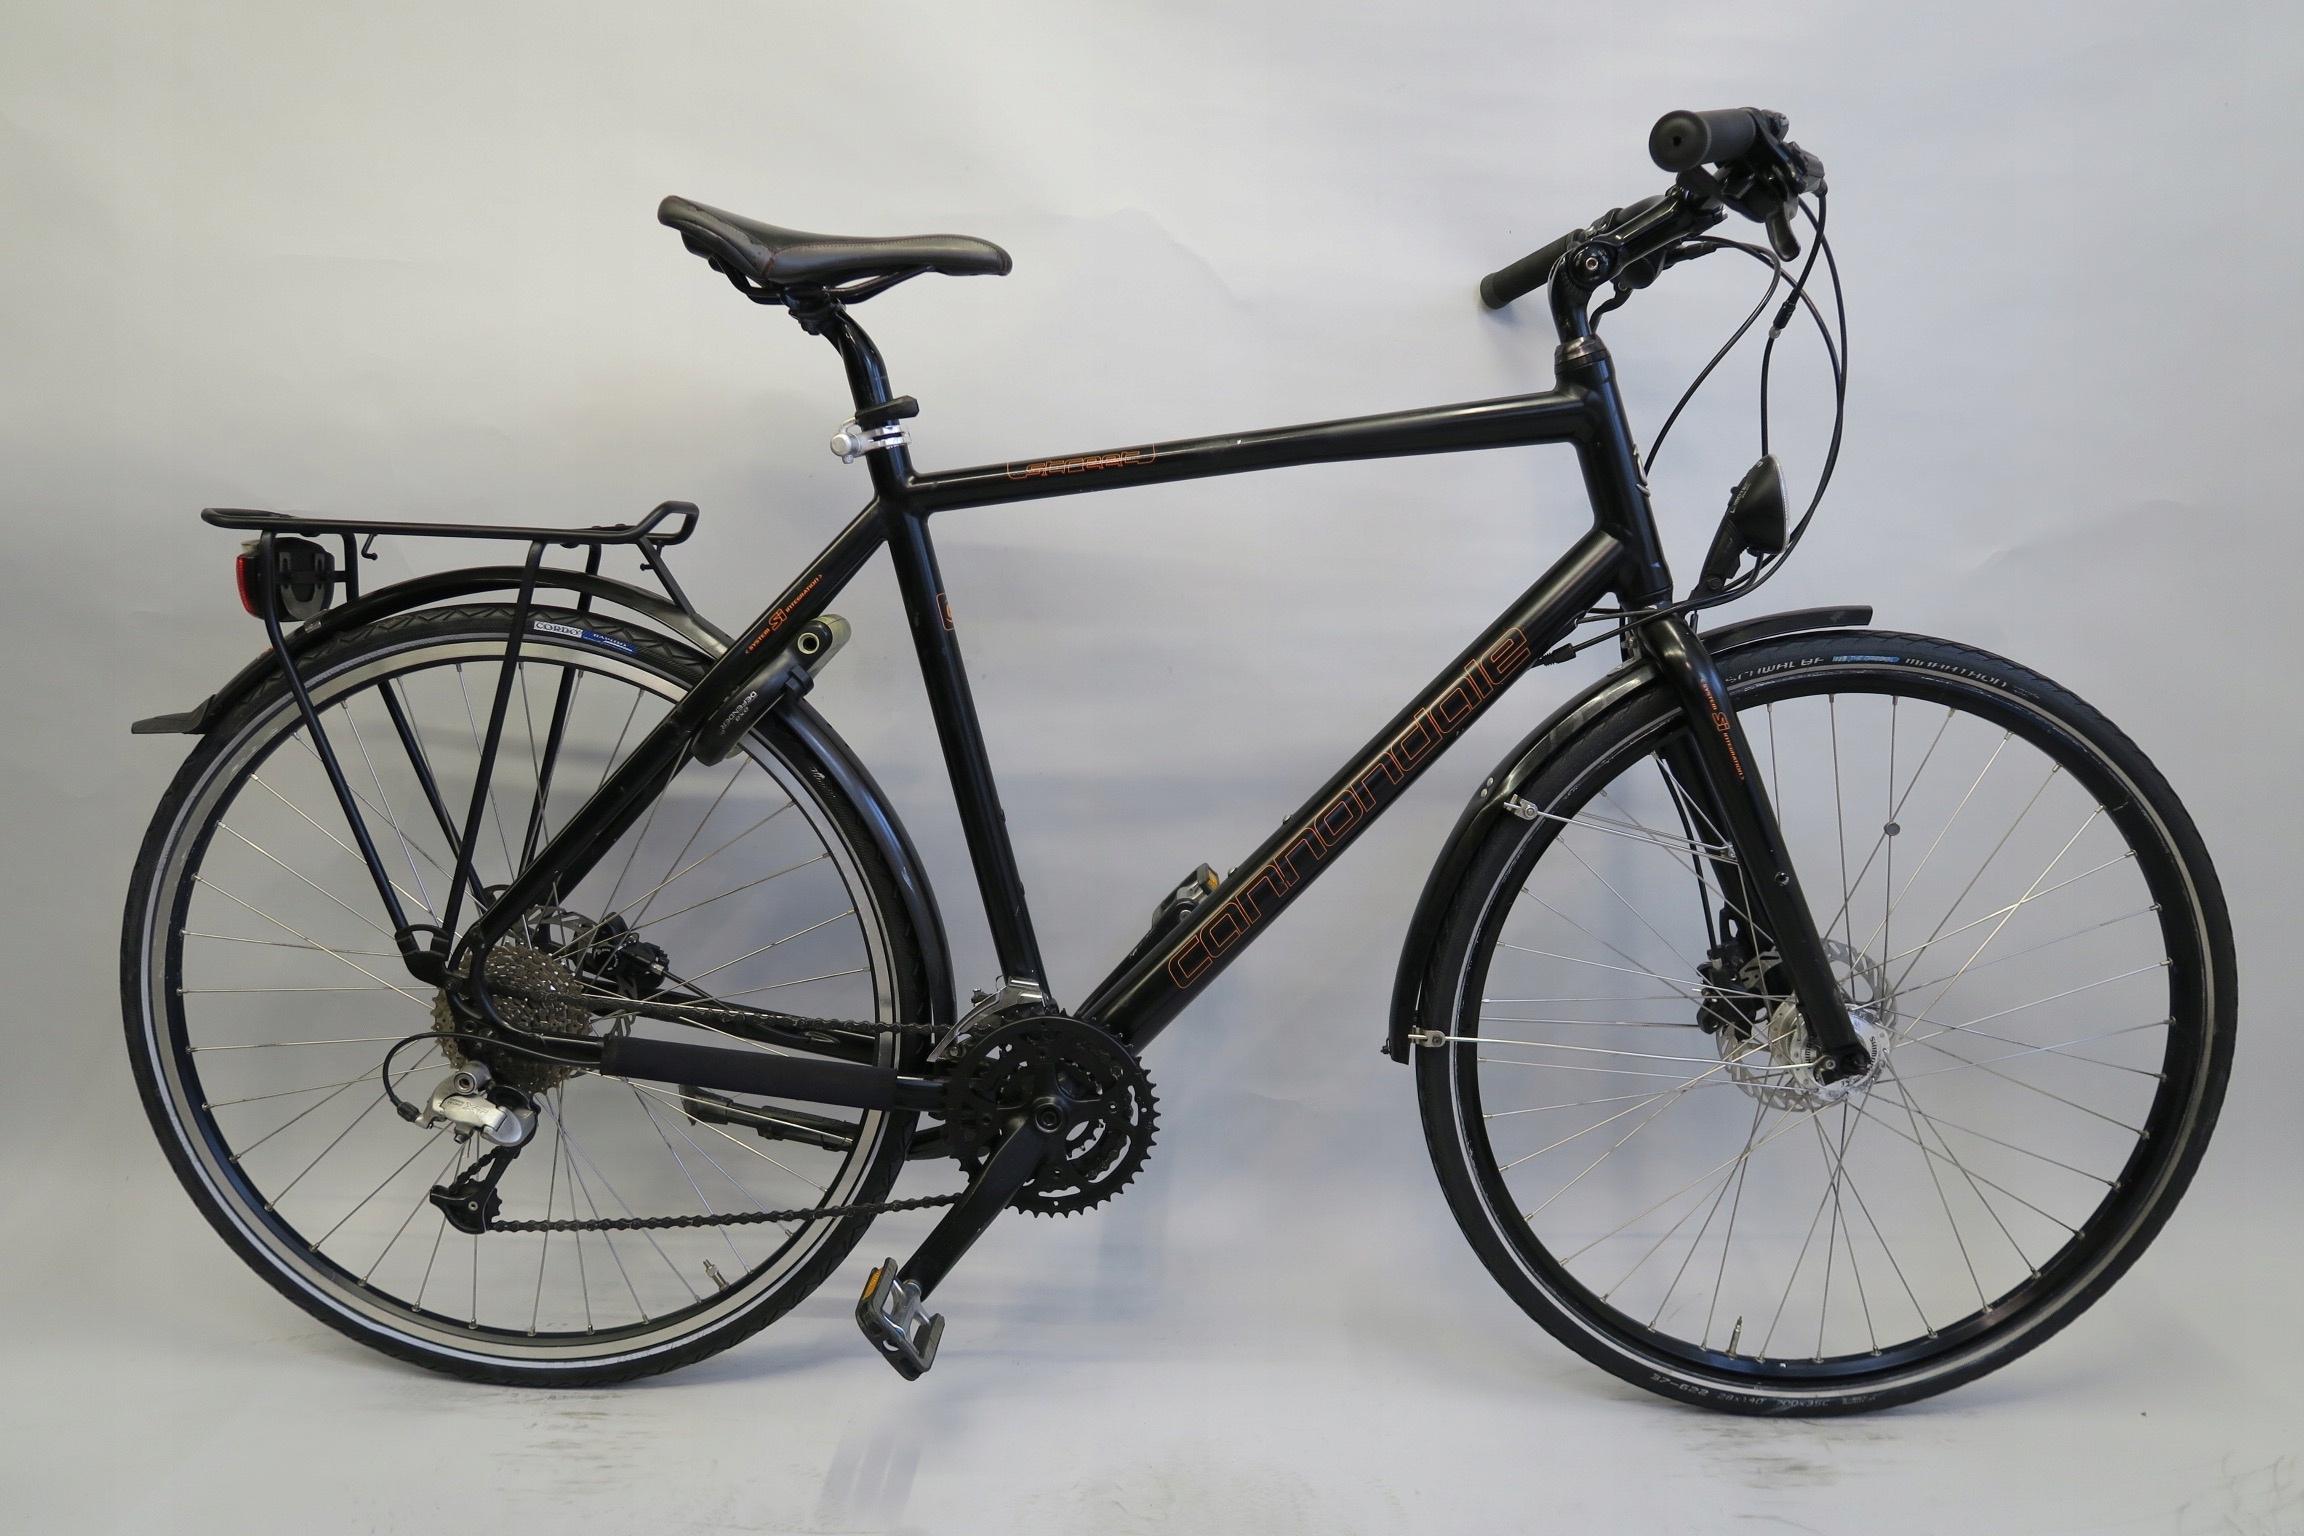 Markowy rower Cannondale Street XT hydraulika